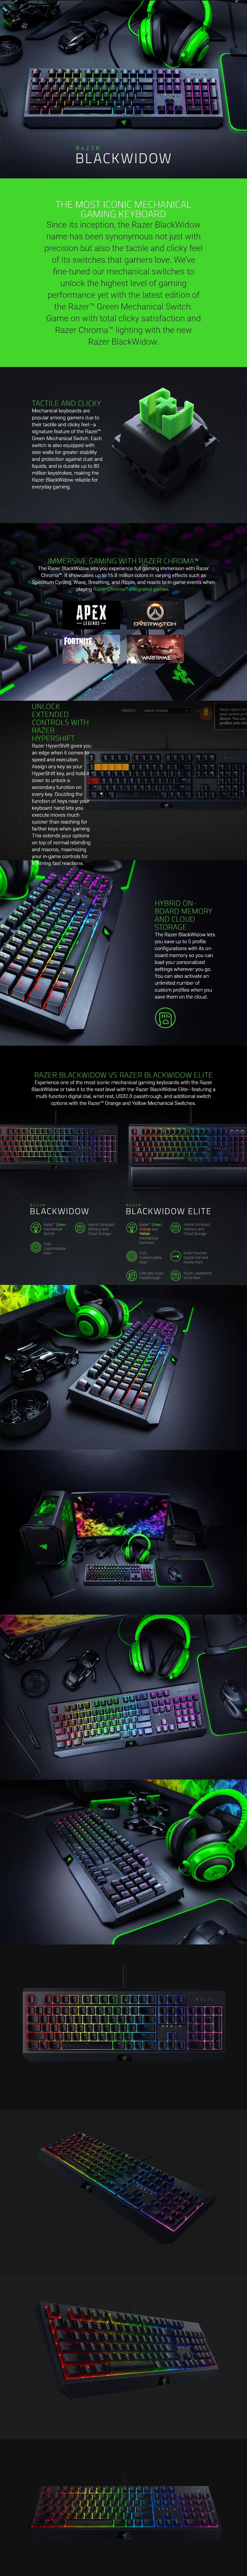 Razer Blackwidow Chroma Mechanical Gaming Keyboard - Green Switch